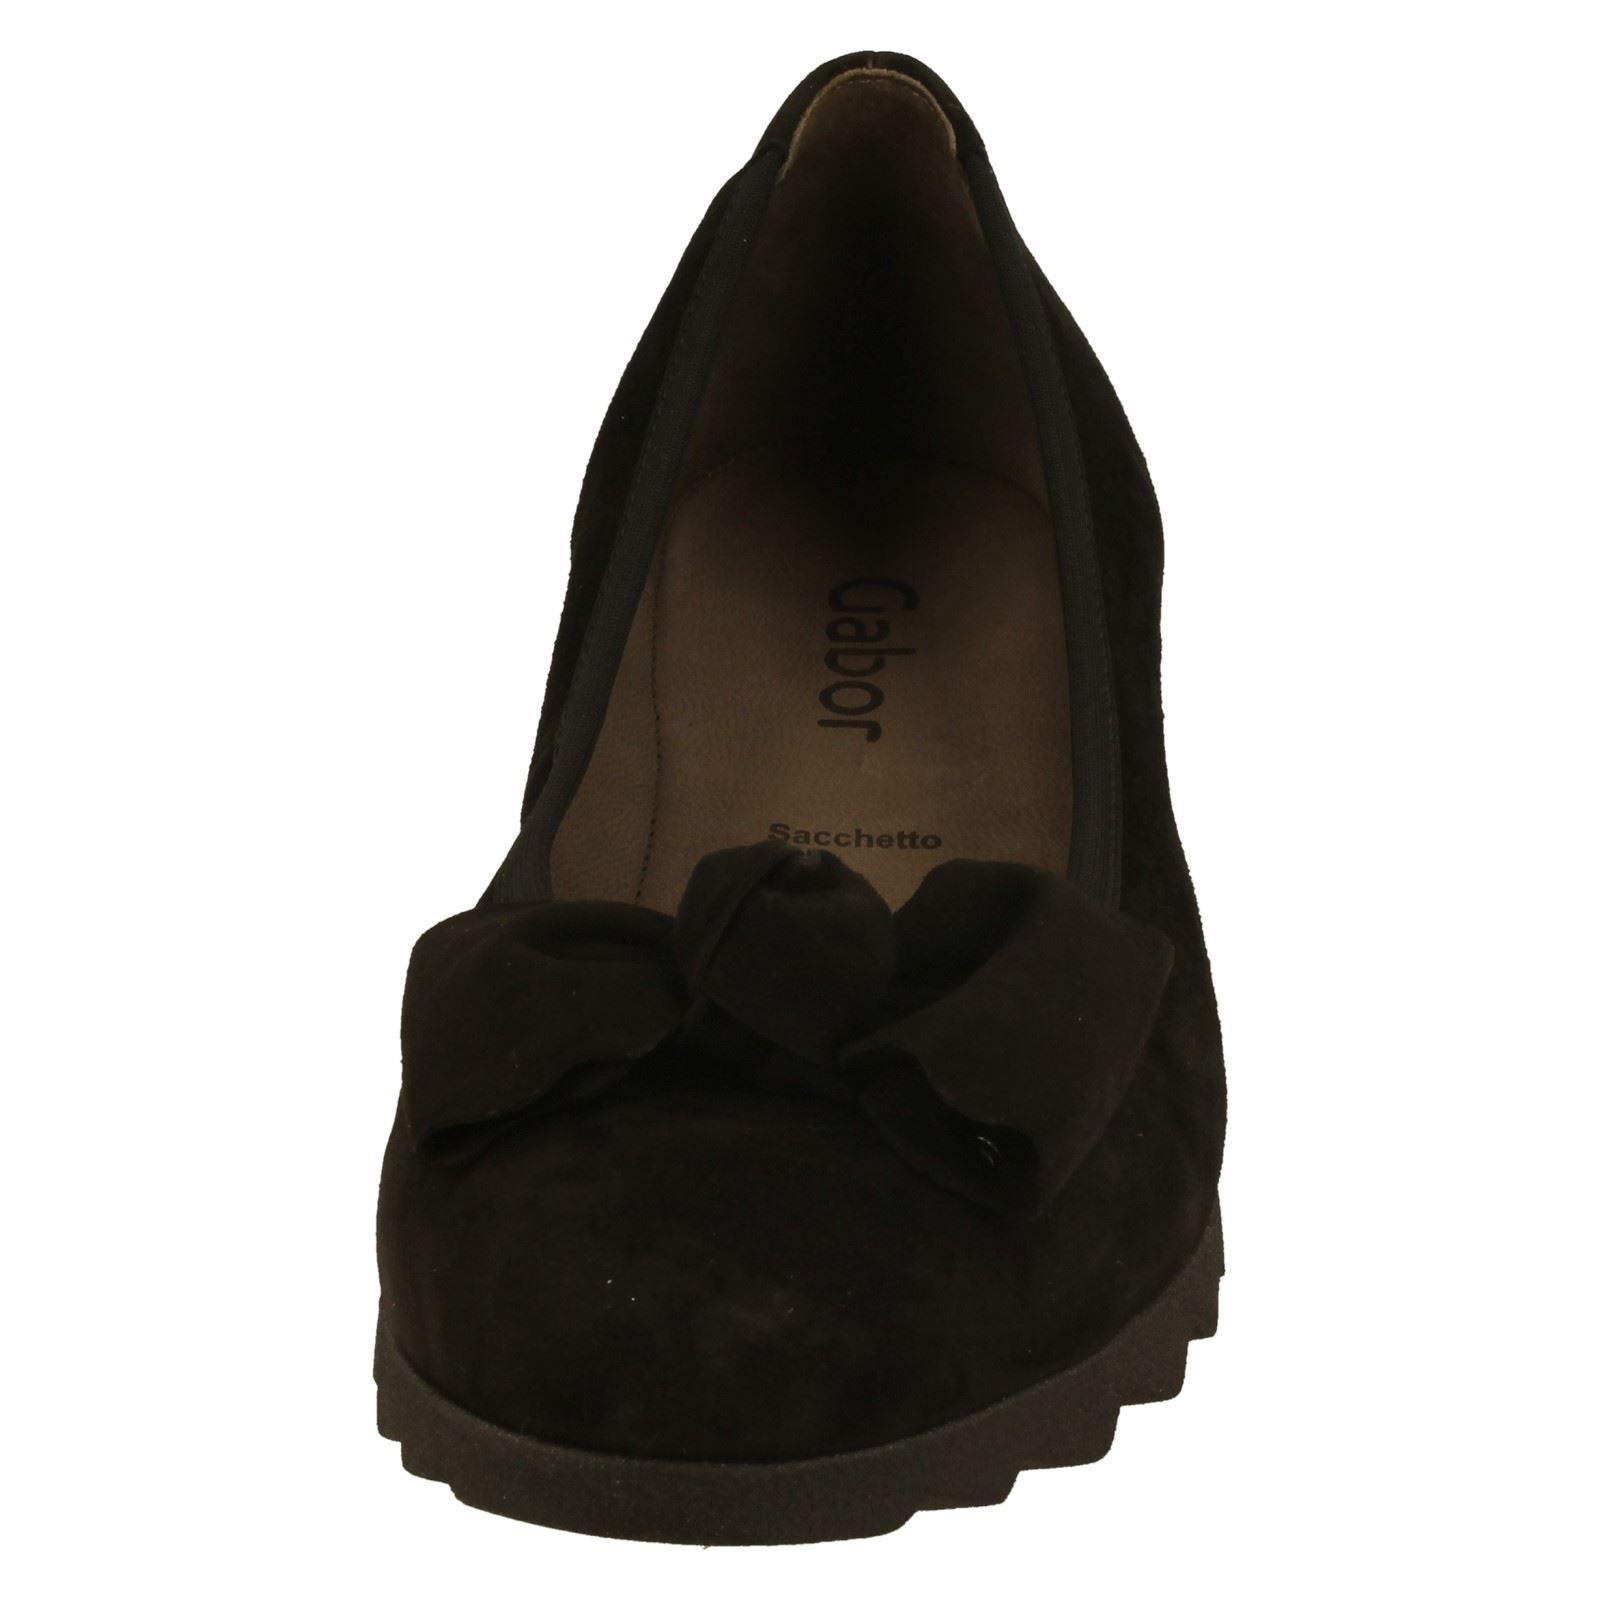 Ladies Gabor Shoes Shoes Gabor The Style 75.321 -W 8c6d77